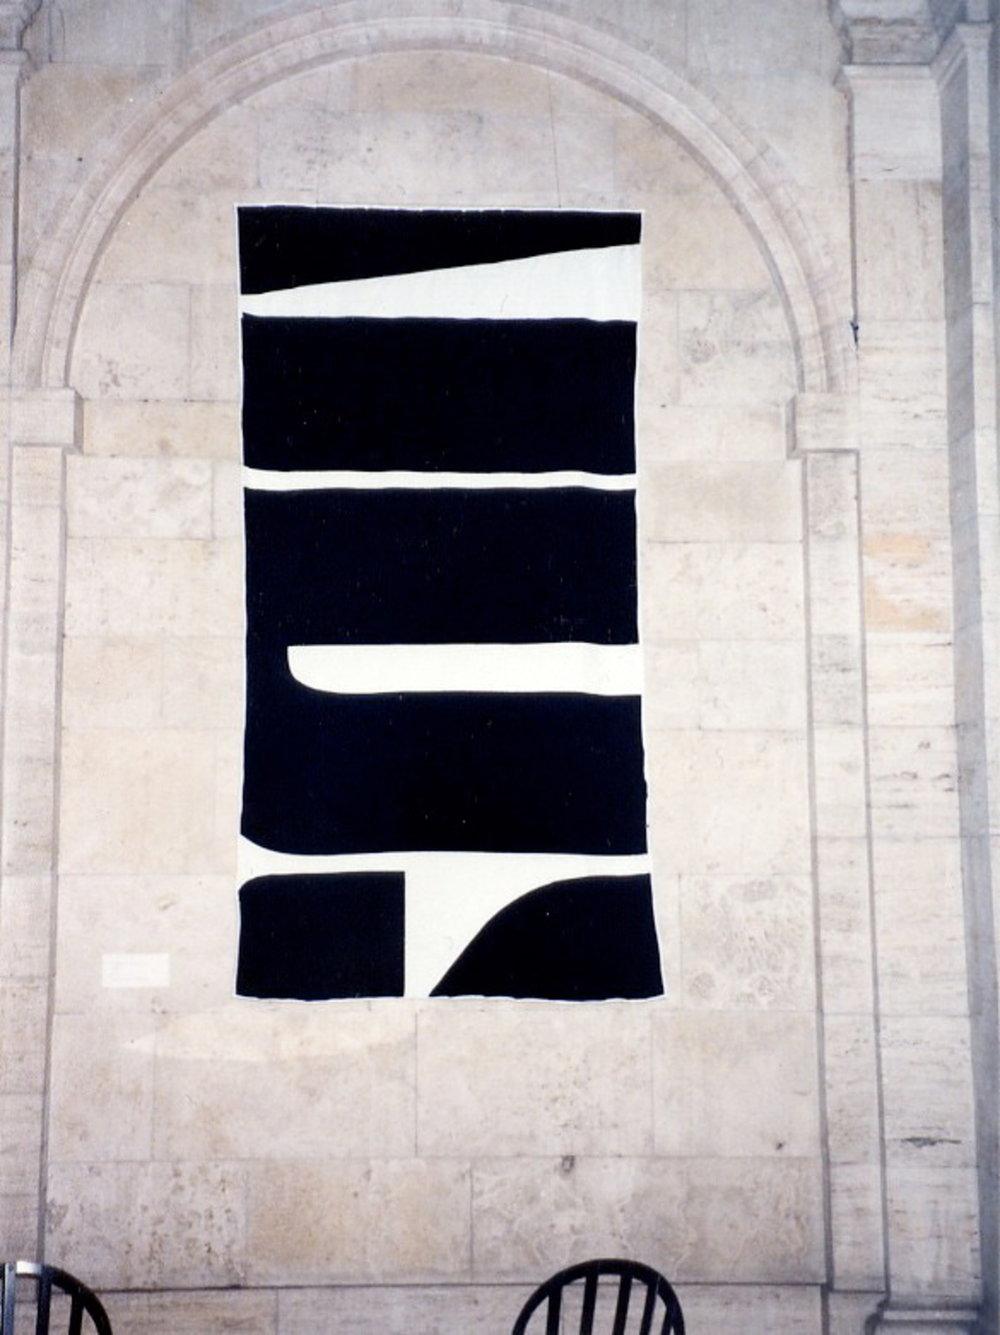 aids flag 98 01-fogg-museum.jpg